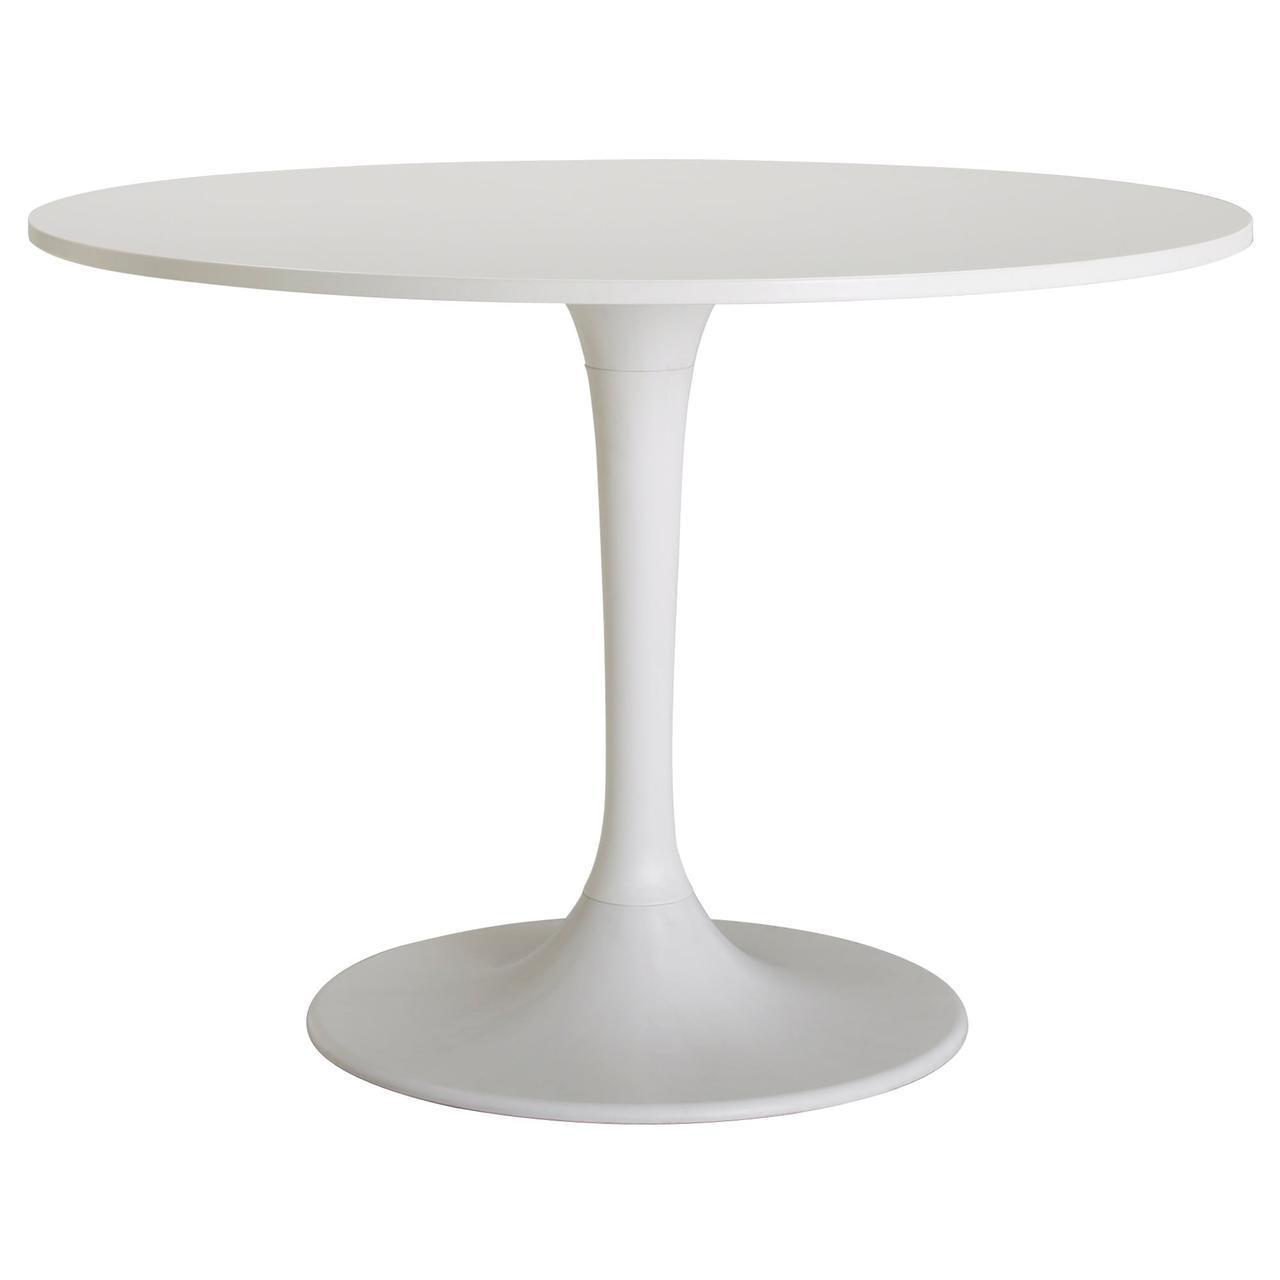 IKEA DOCKSTA (193.249.95) Стол, белый.ДОКСТА Стол, белый, белый